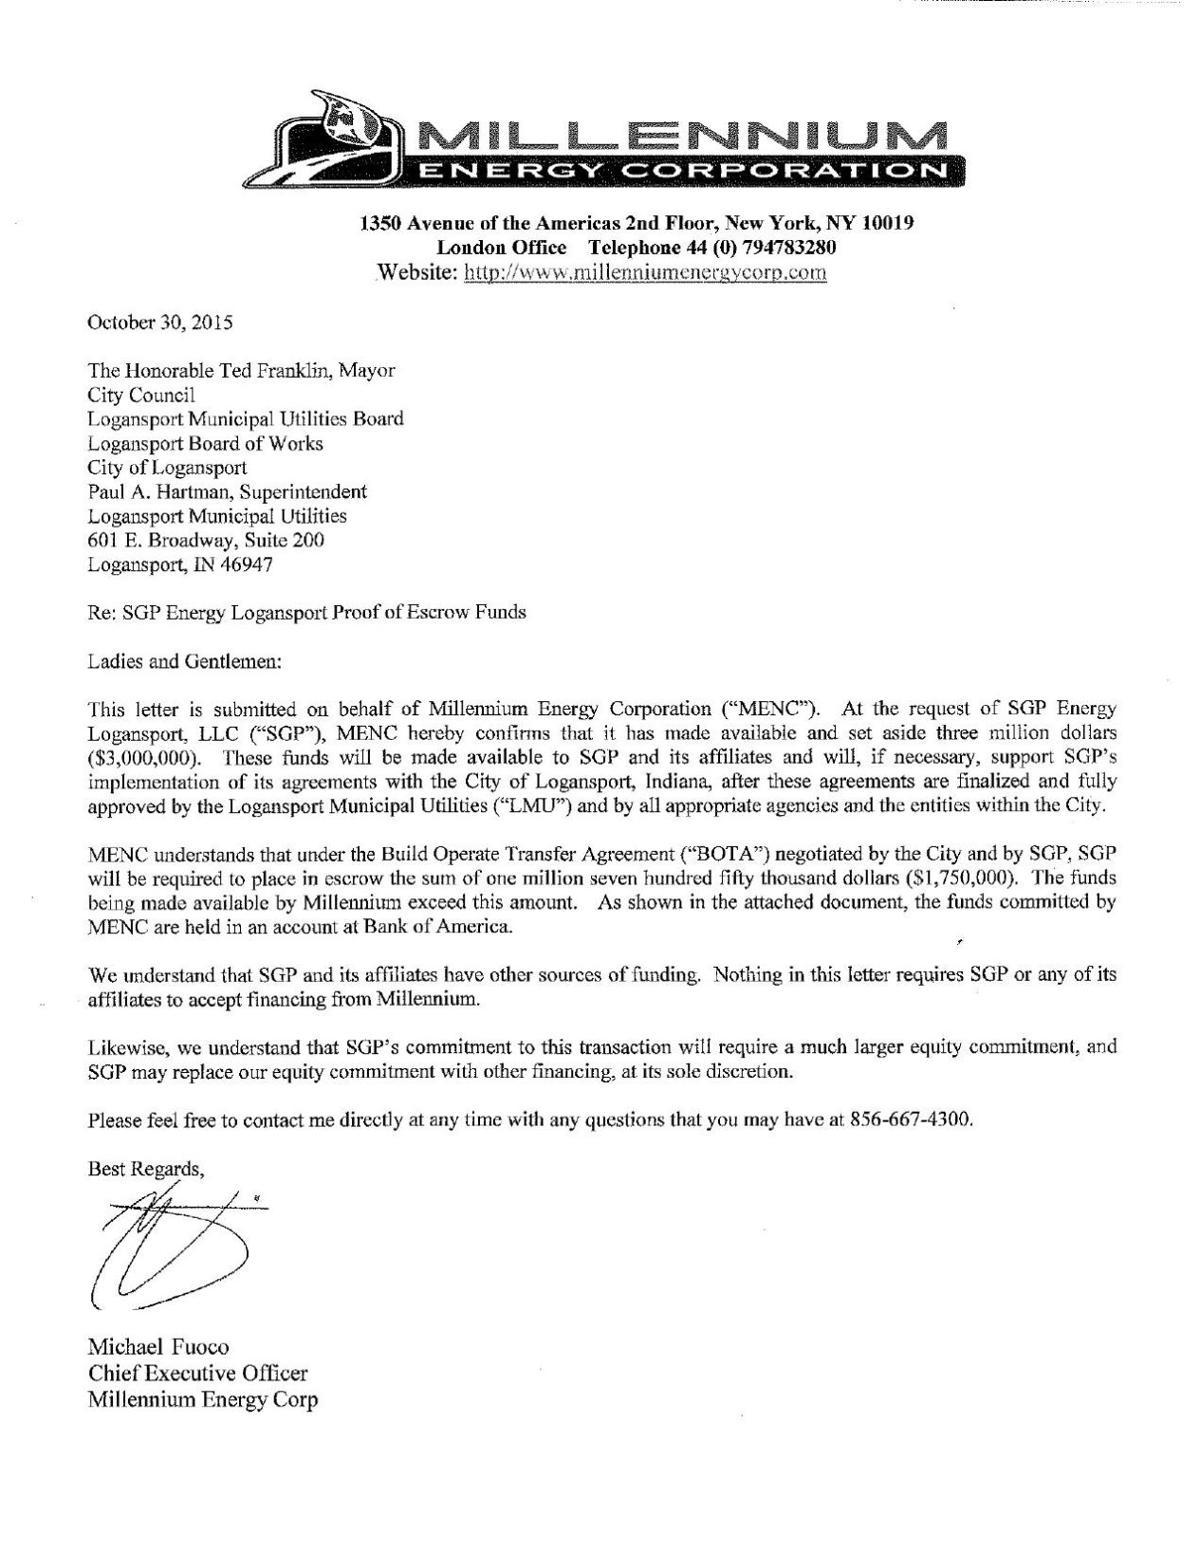 Millennium Energy Corp Letter Pharostribune